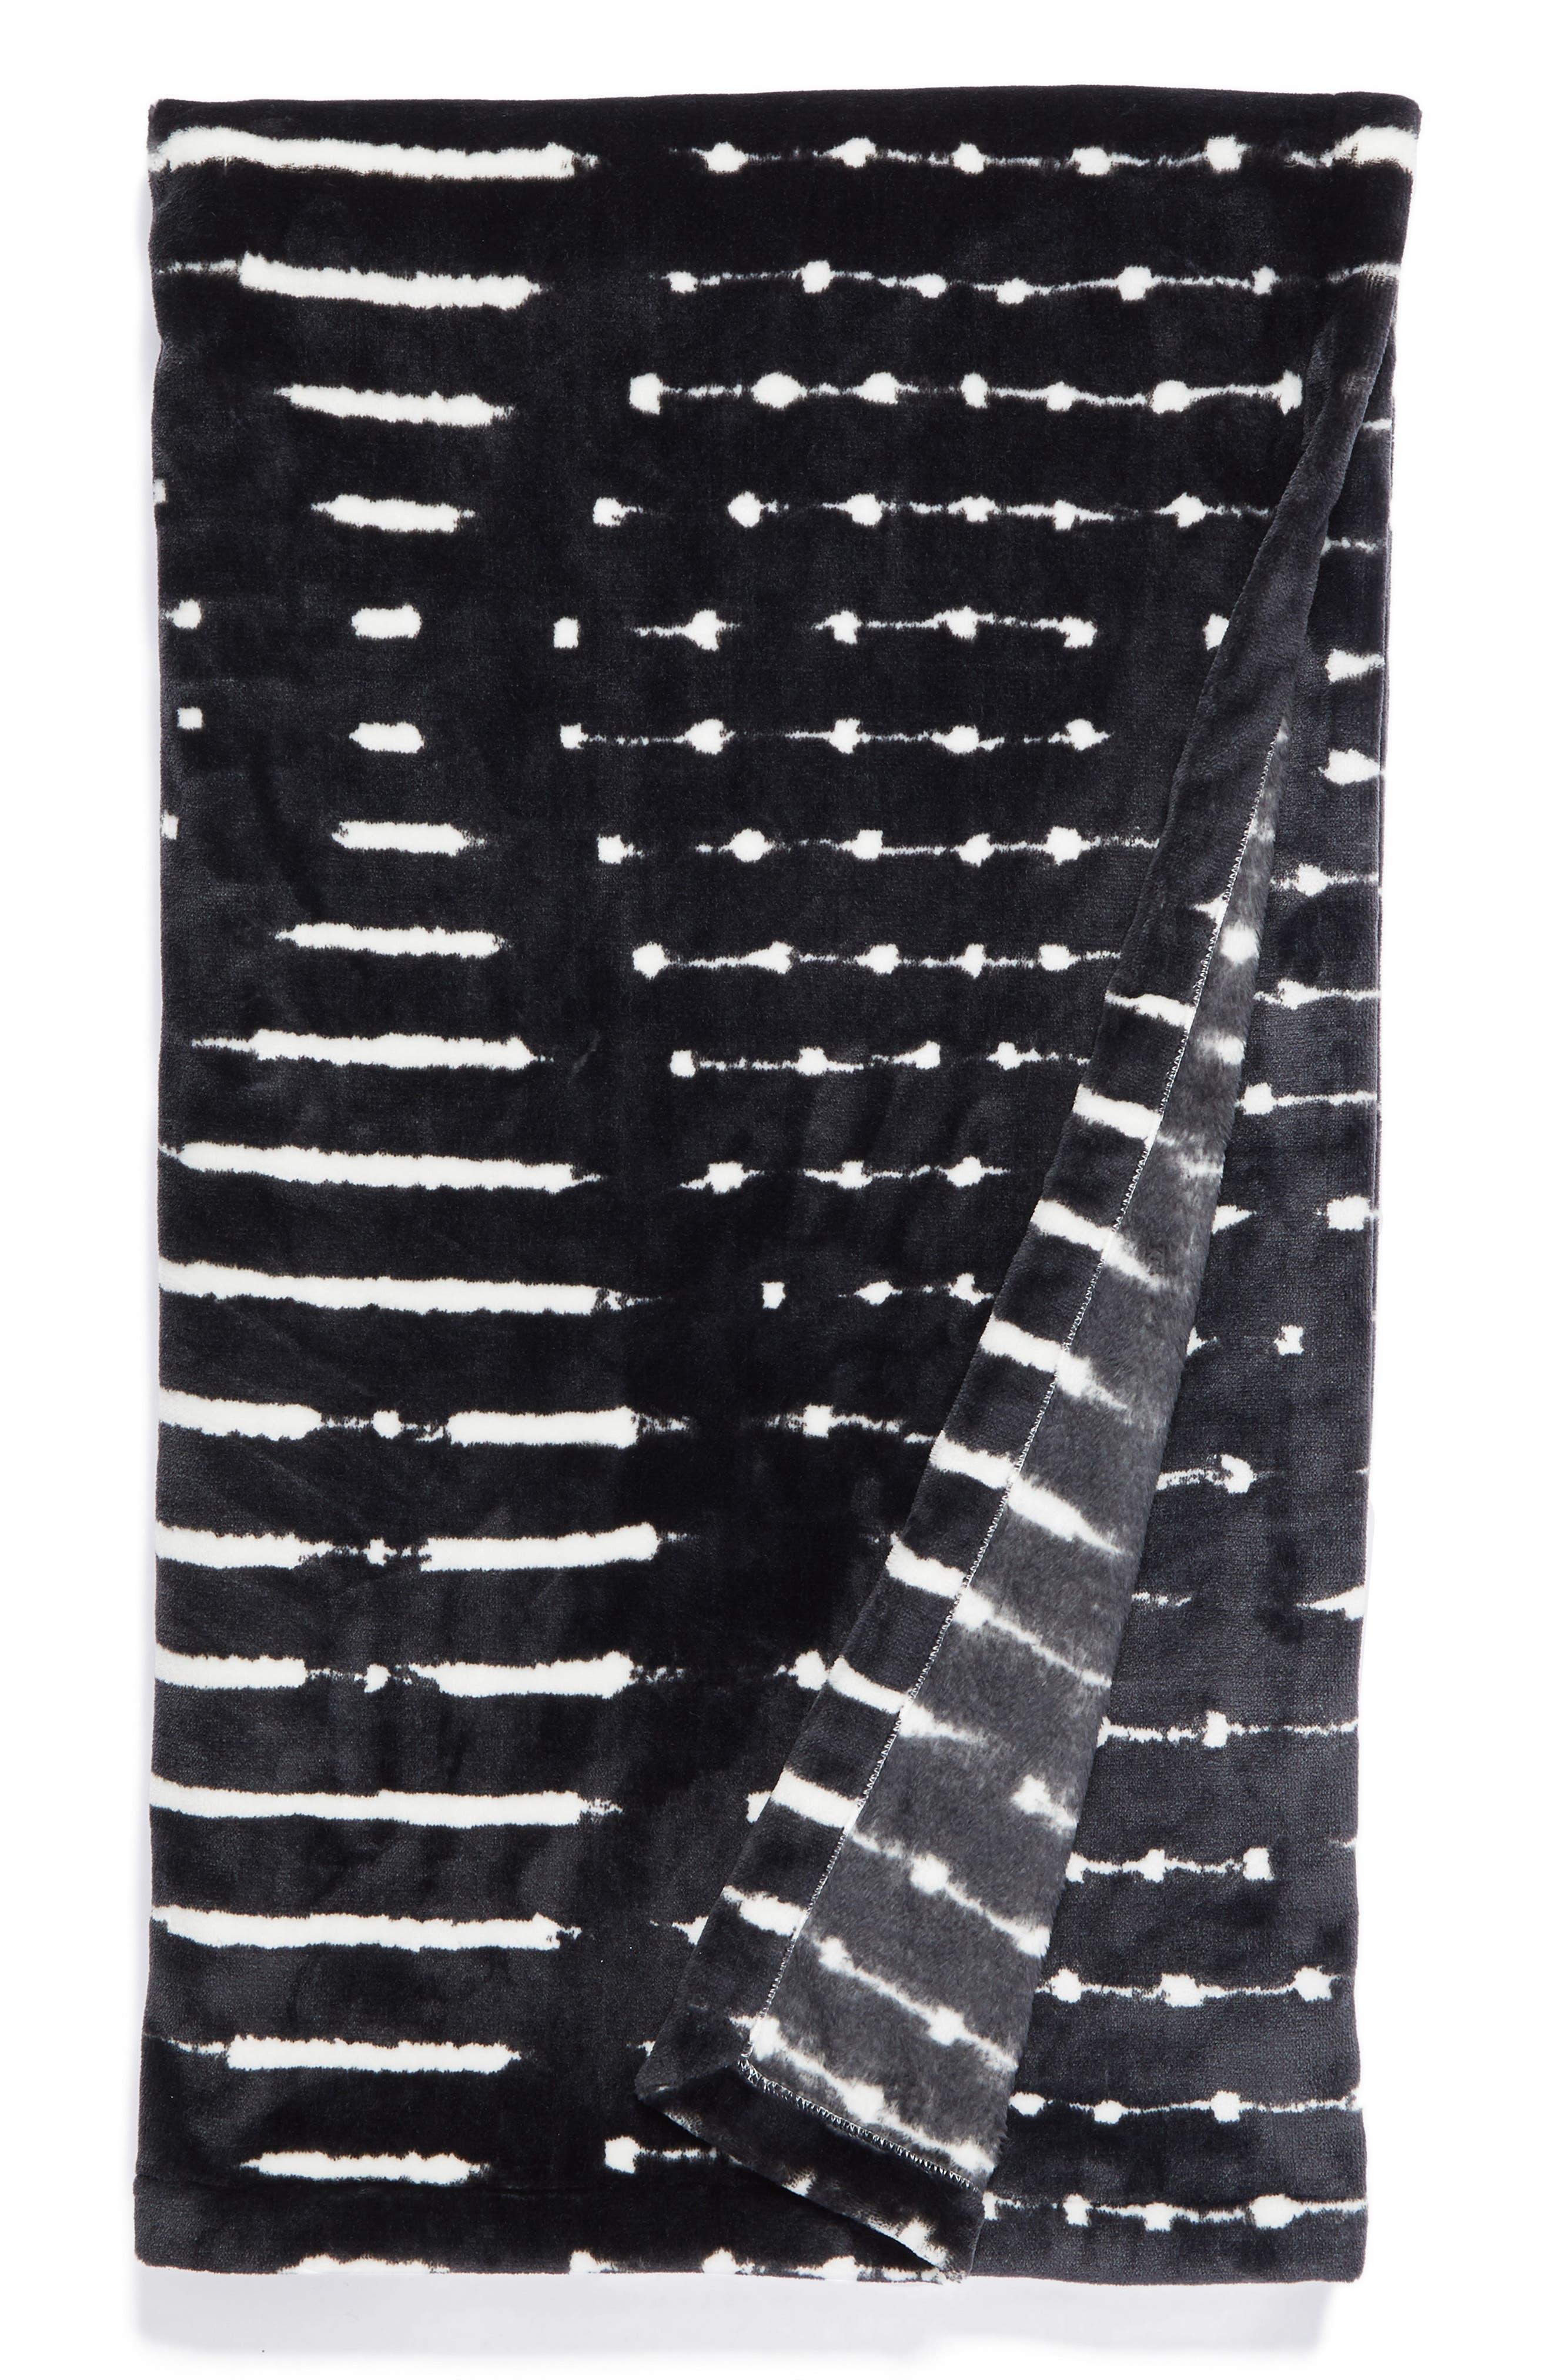 Levtex Mudcloth Plush Throw Blanket